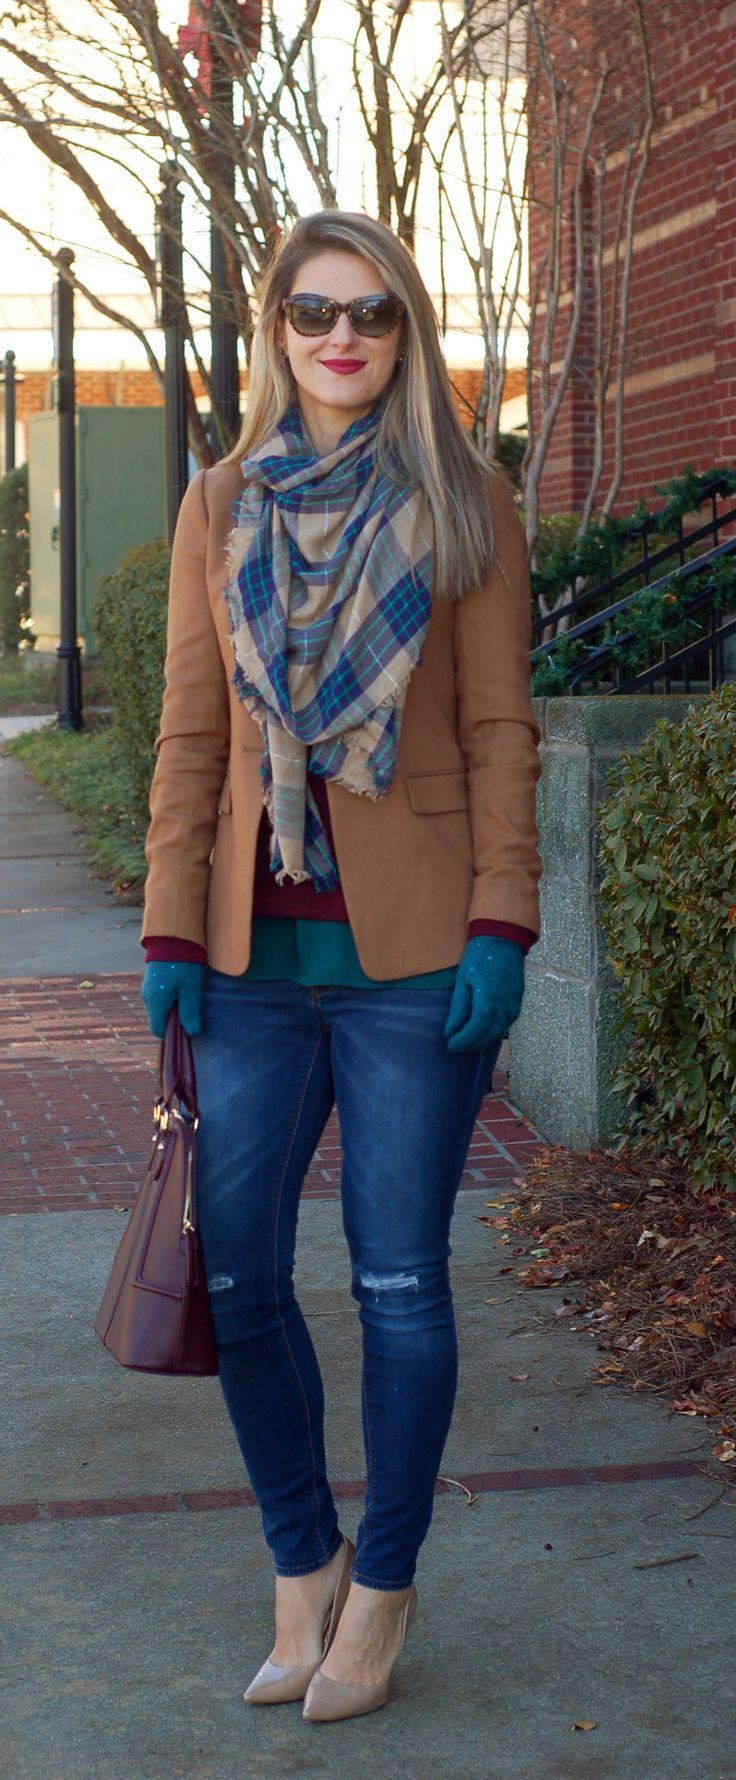 Teodora's Lookbook - camel blazer, burgundy purse, teal accessories